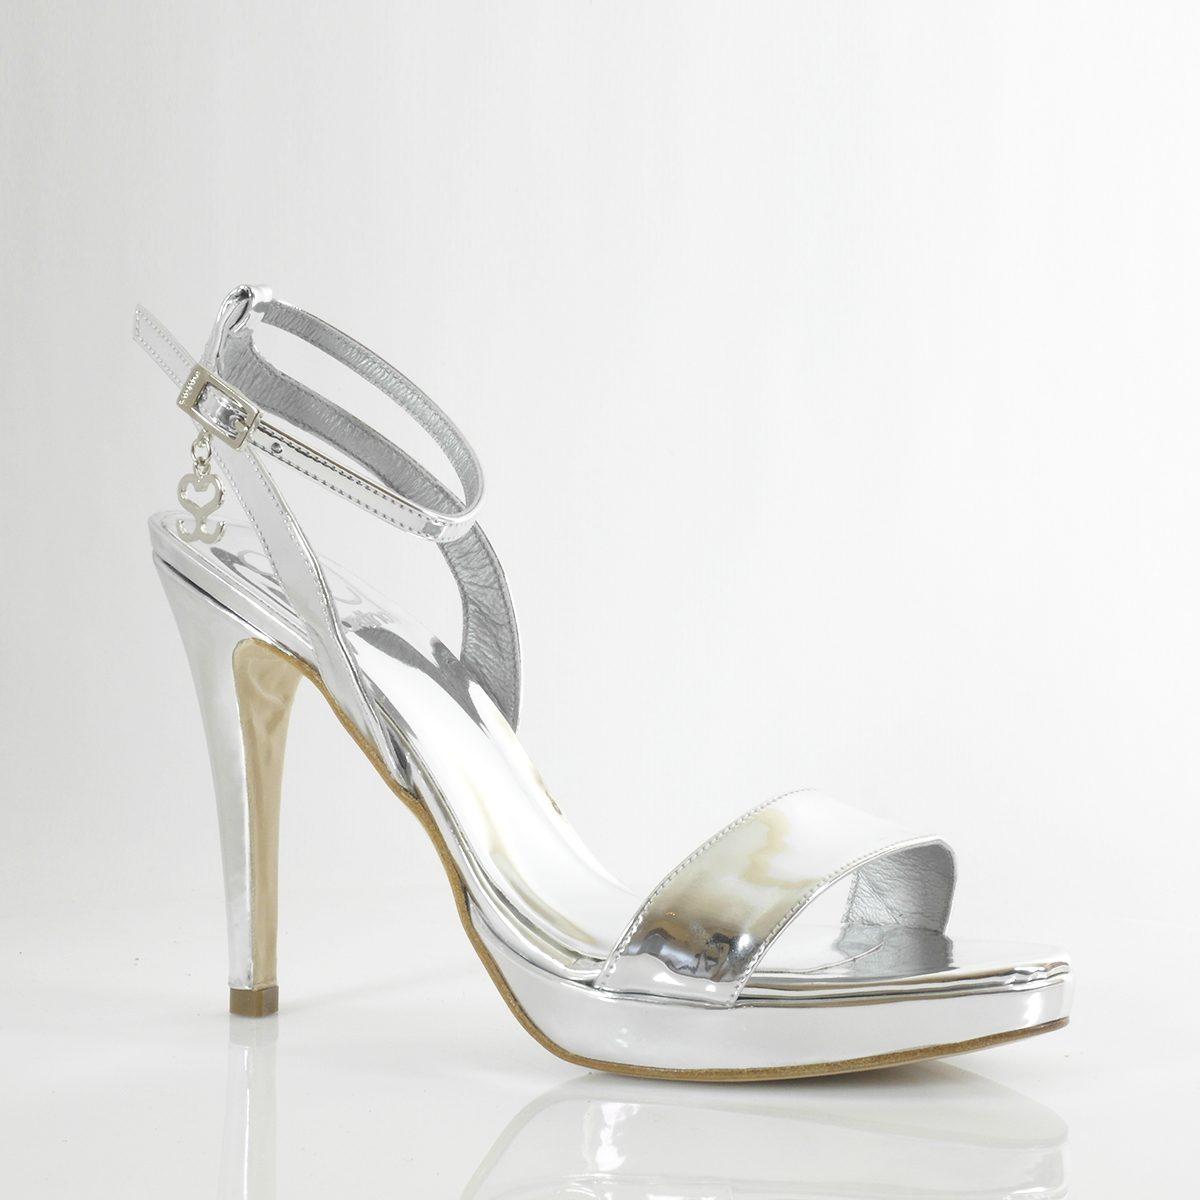 SANDALIA MOD.1378 (11cm) - zapatos personalizadas fiesta